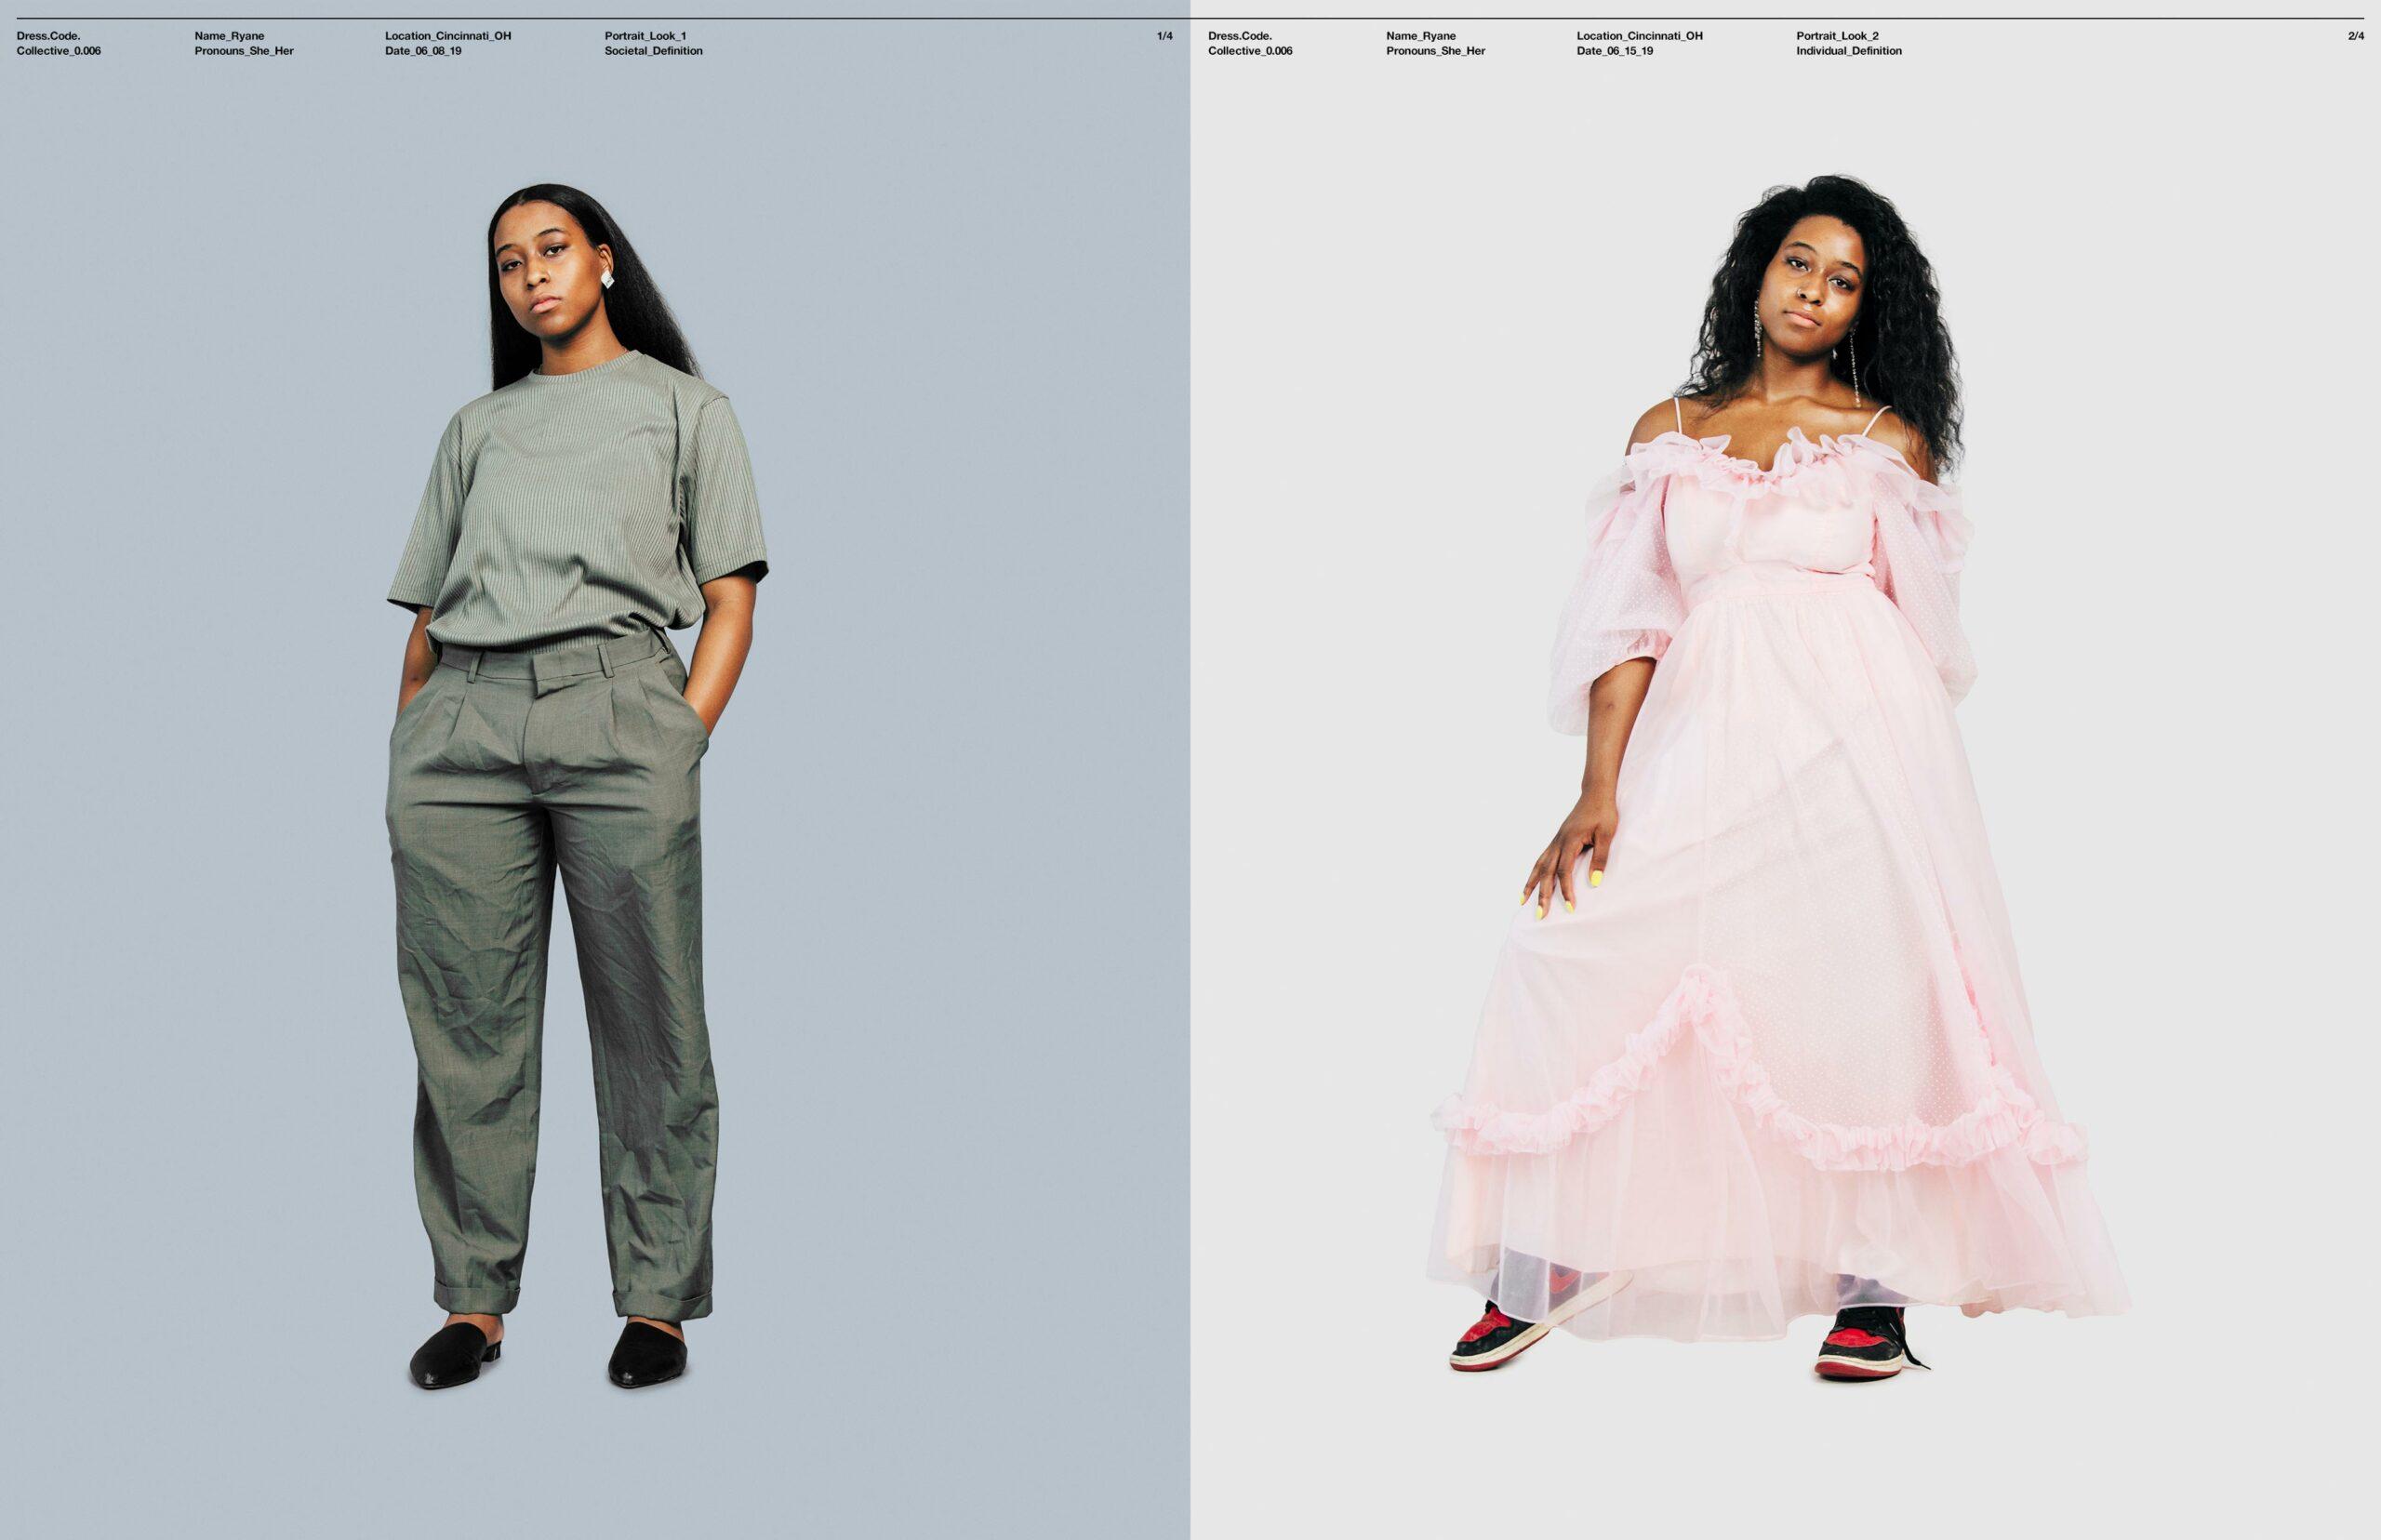 01-Dress-Code03